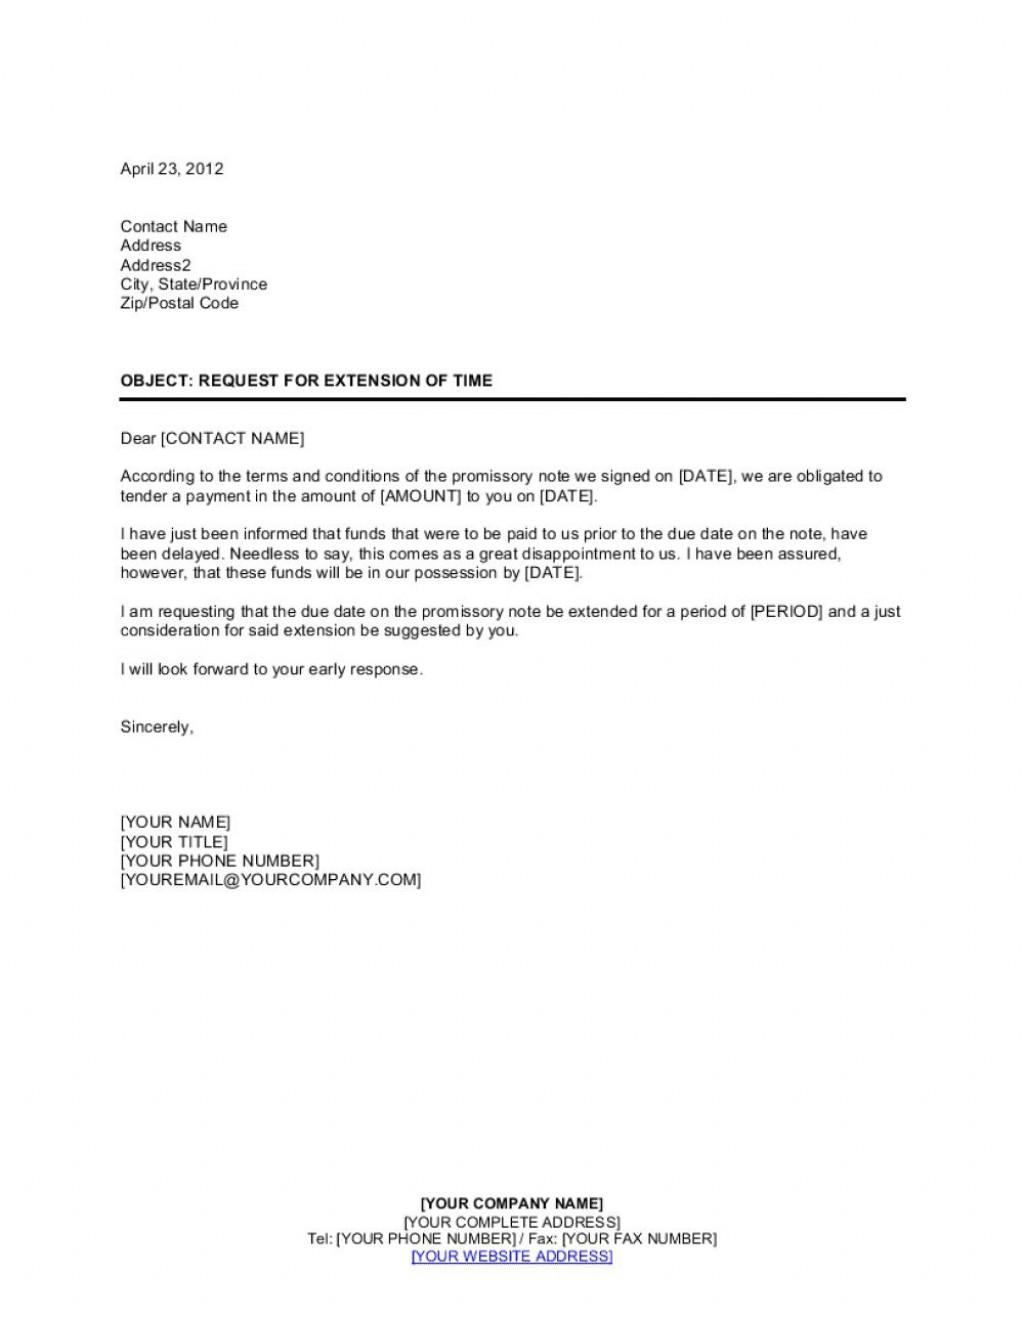 008 Impressive Blank Promissory Note Template Sample  Form Free DownloadLarge